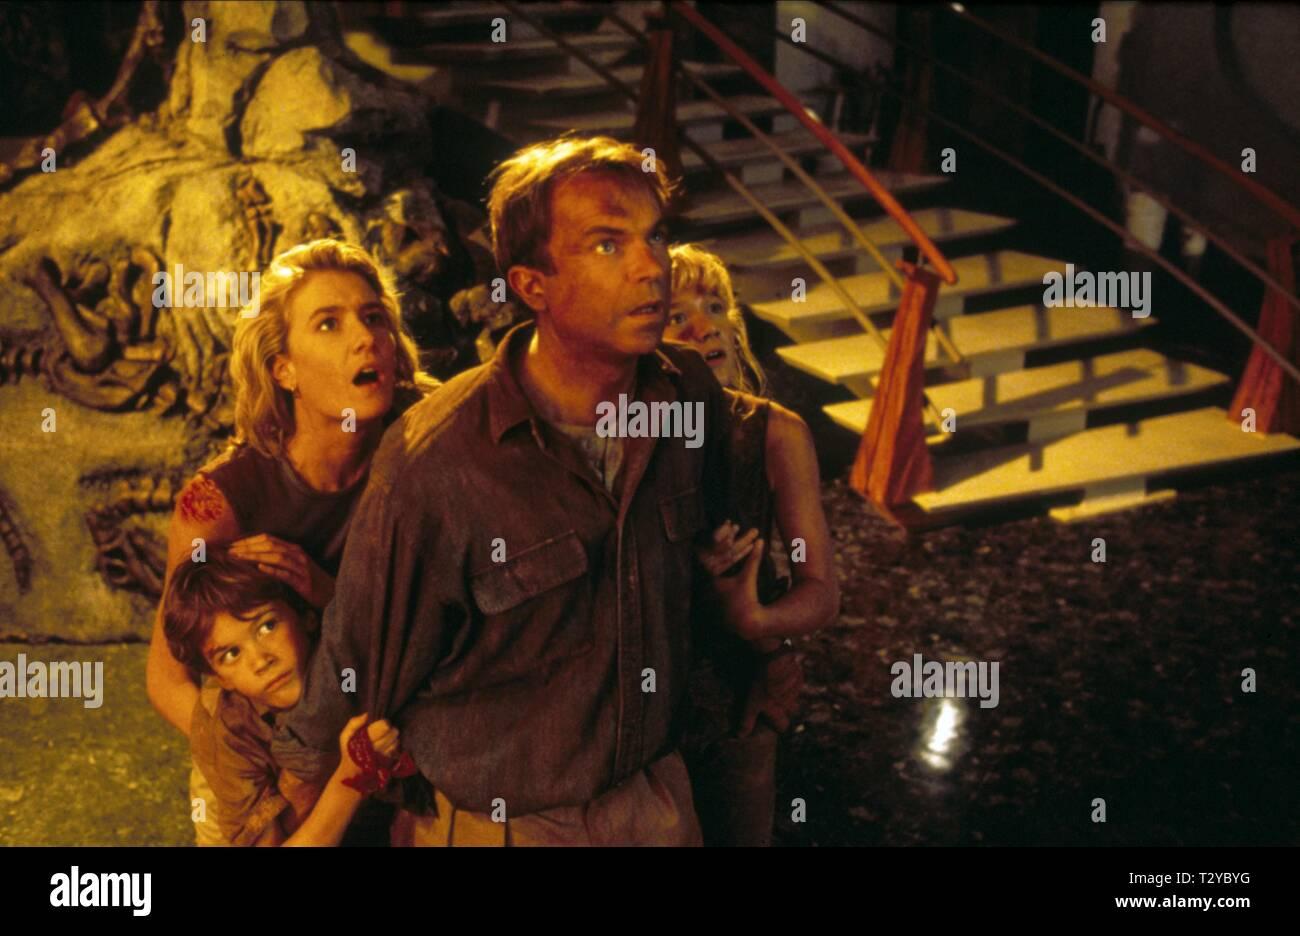 JURASSIC PARK, JOSEPH MAZZELLO, LAURA DERN, SAM NEILL , ARIANA RICHARDS, 1993 - Stock Image